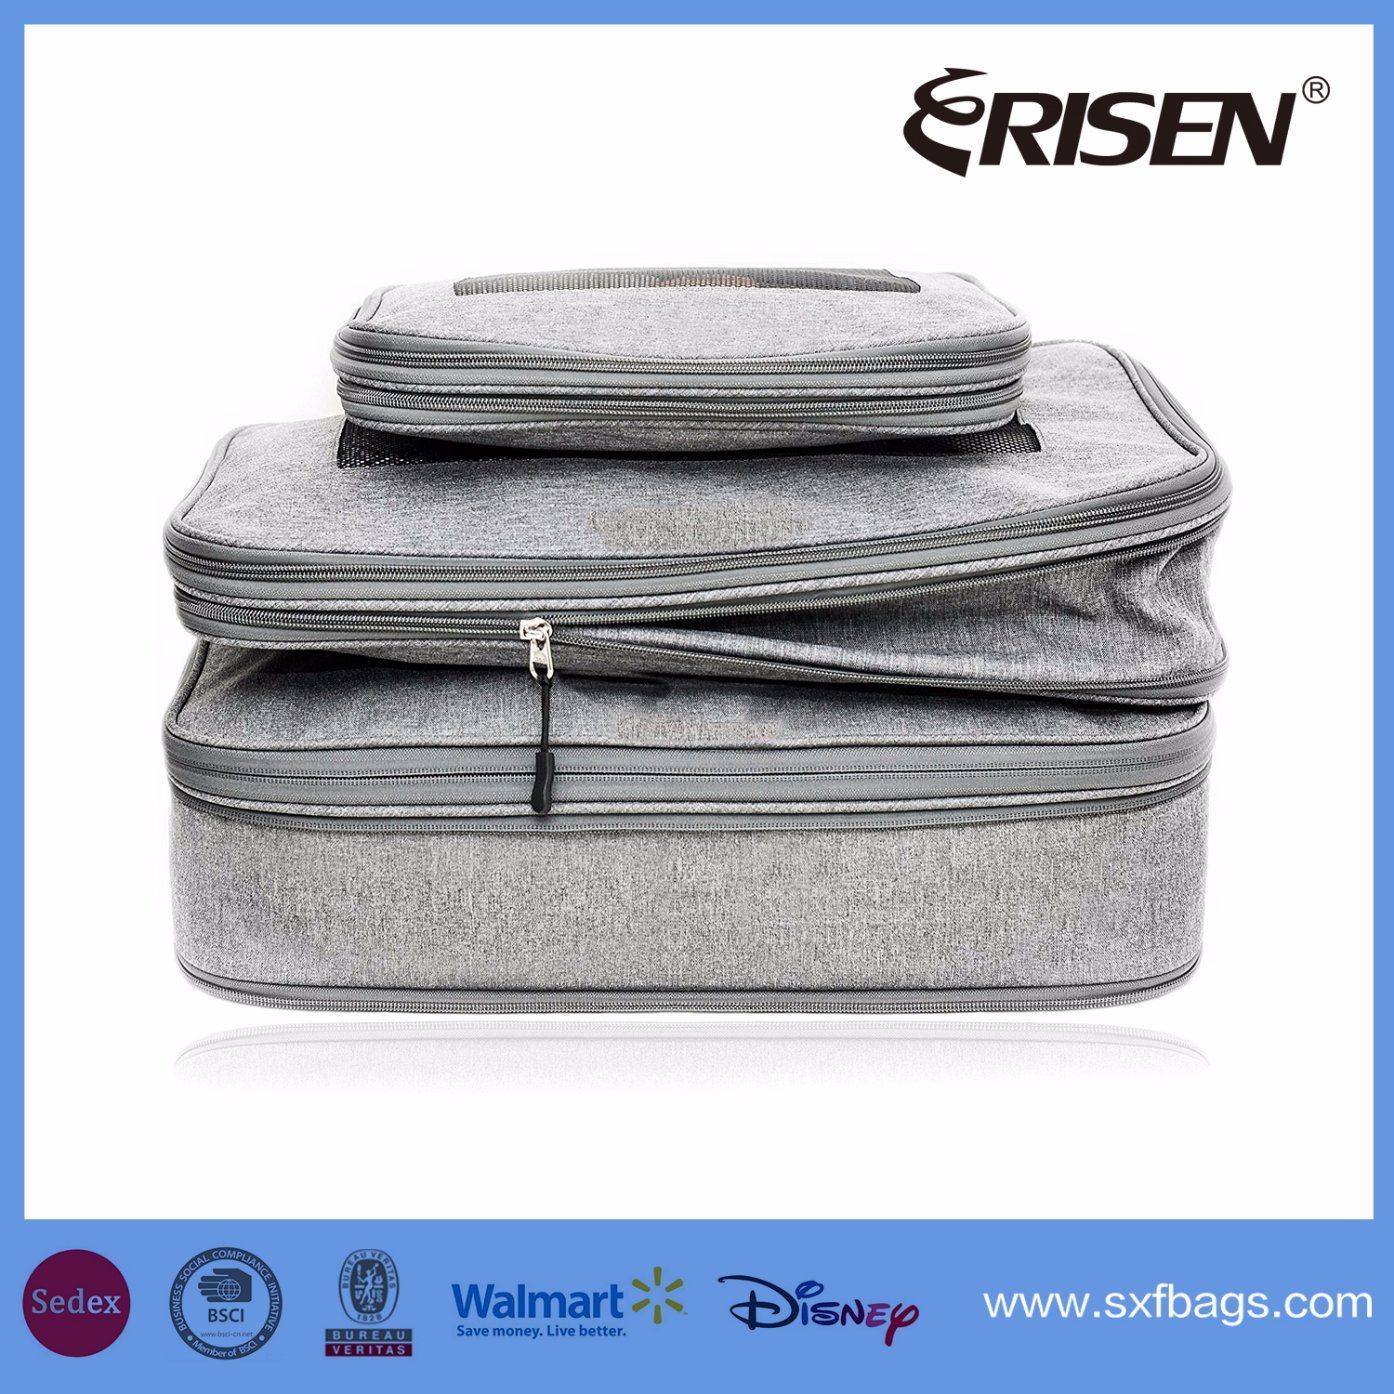 Slim Basics 4 Piece Packing Travel Organizer Cubes Set Grey